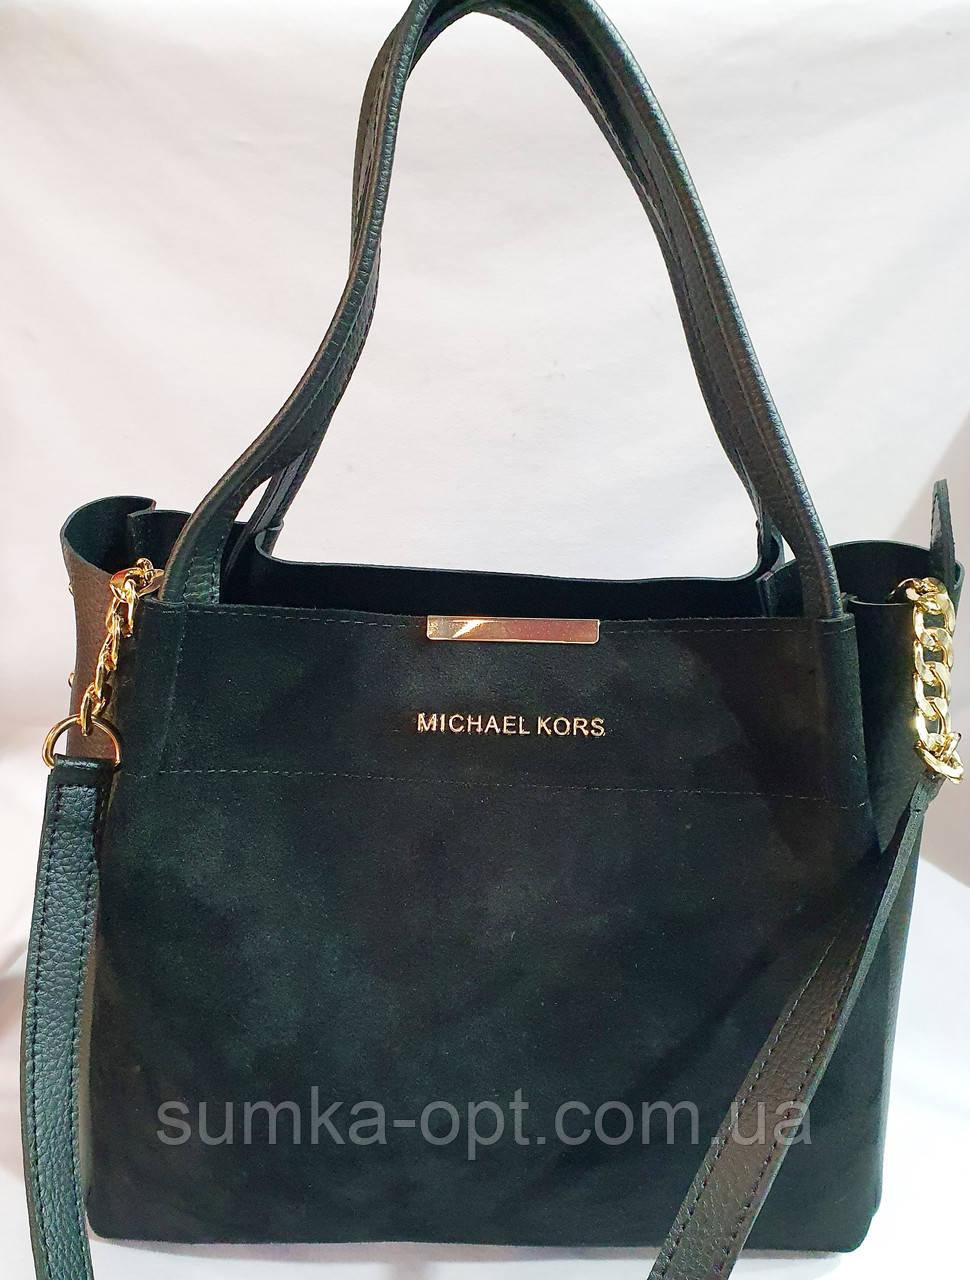 Брендовая женская сумка Michael Kors черная 32*29 см (натуральная замша)